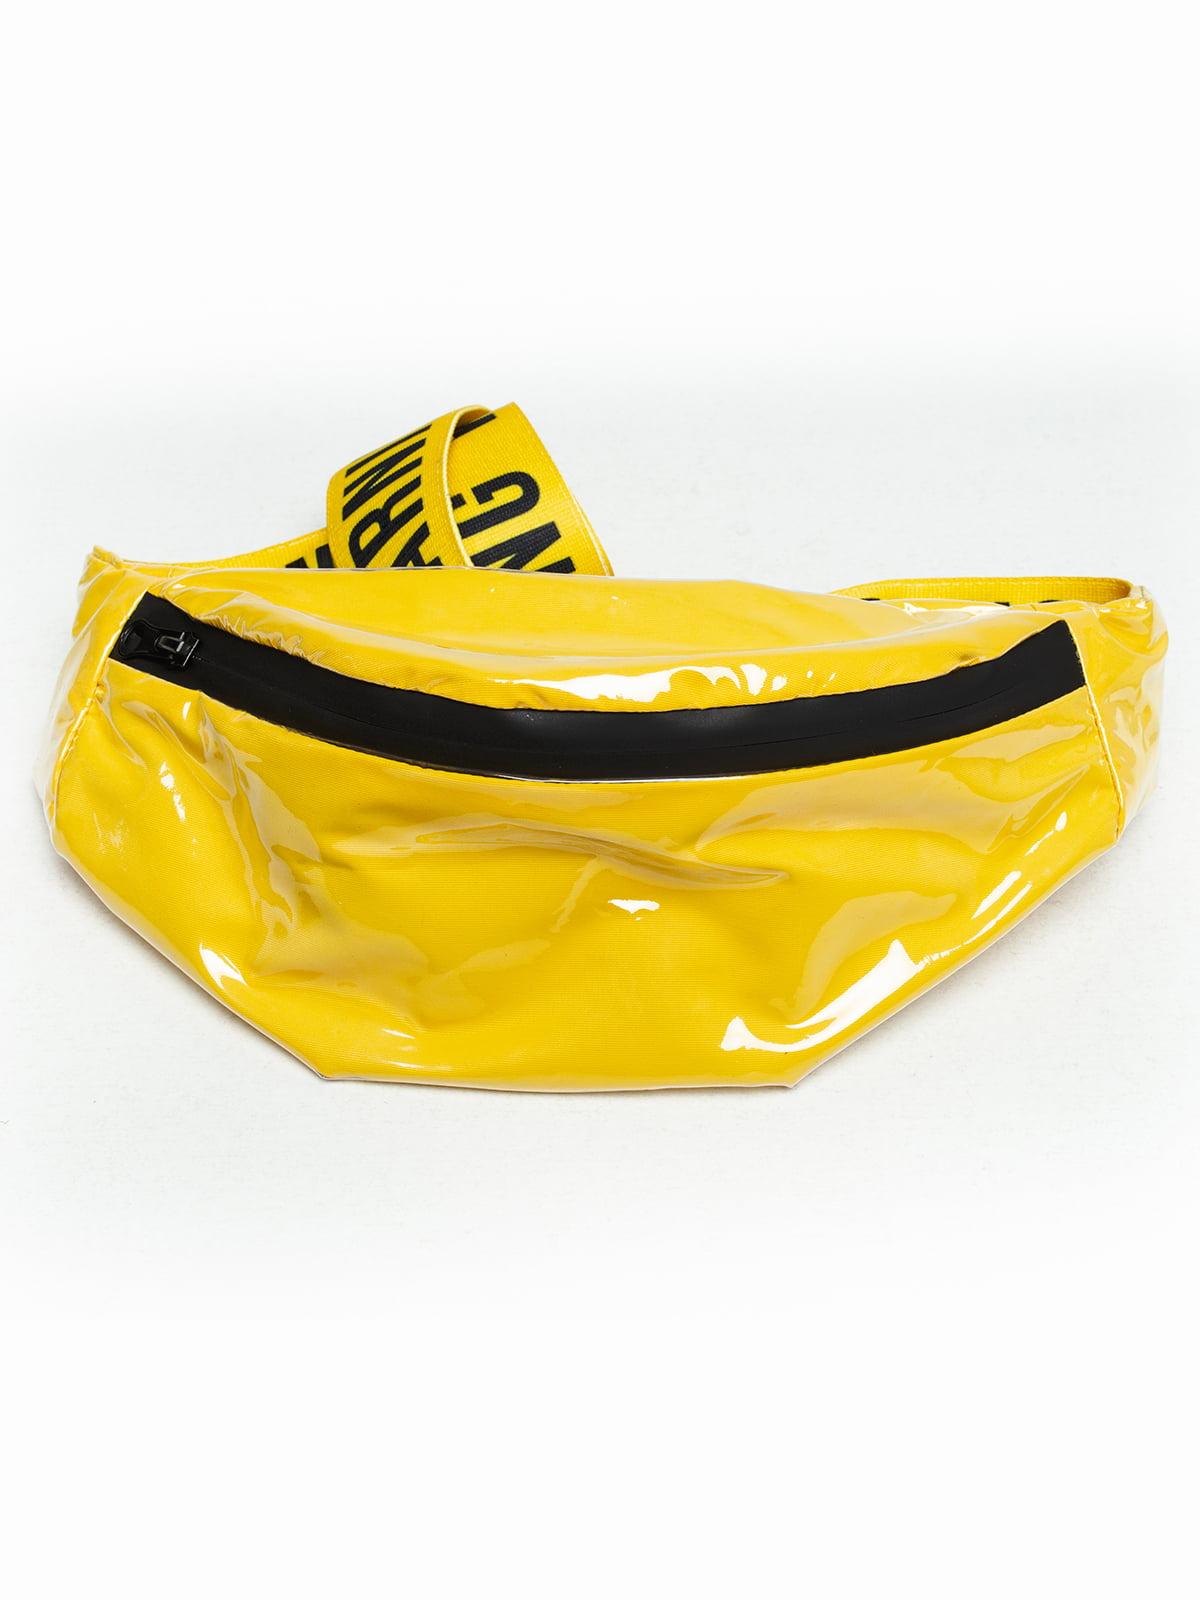 Сумка жовта з принтом | 5421515